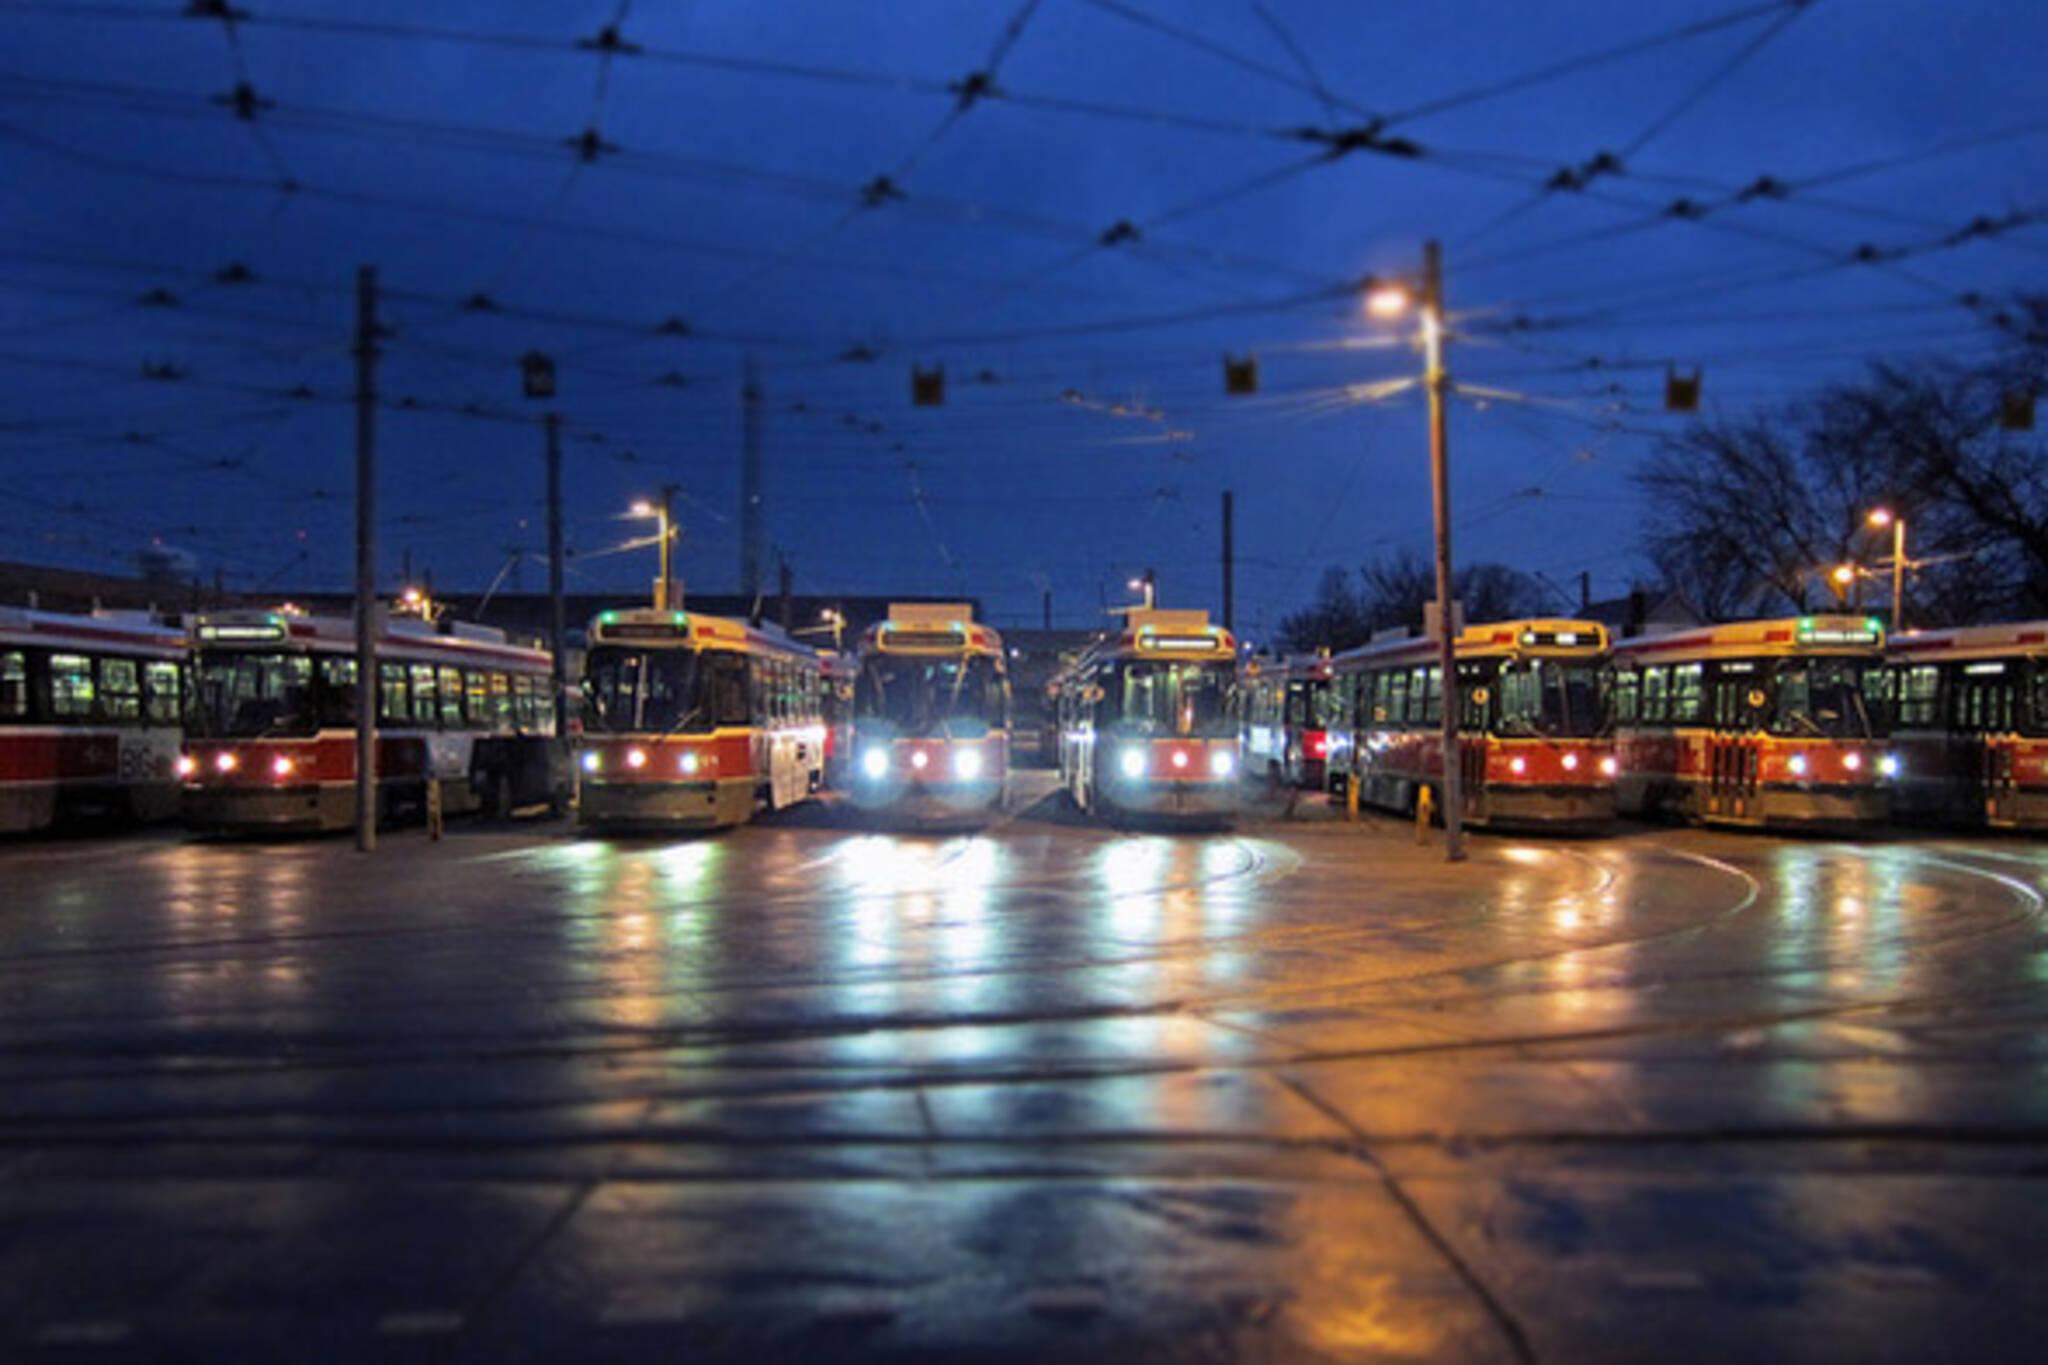 streetcar station